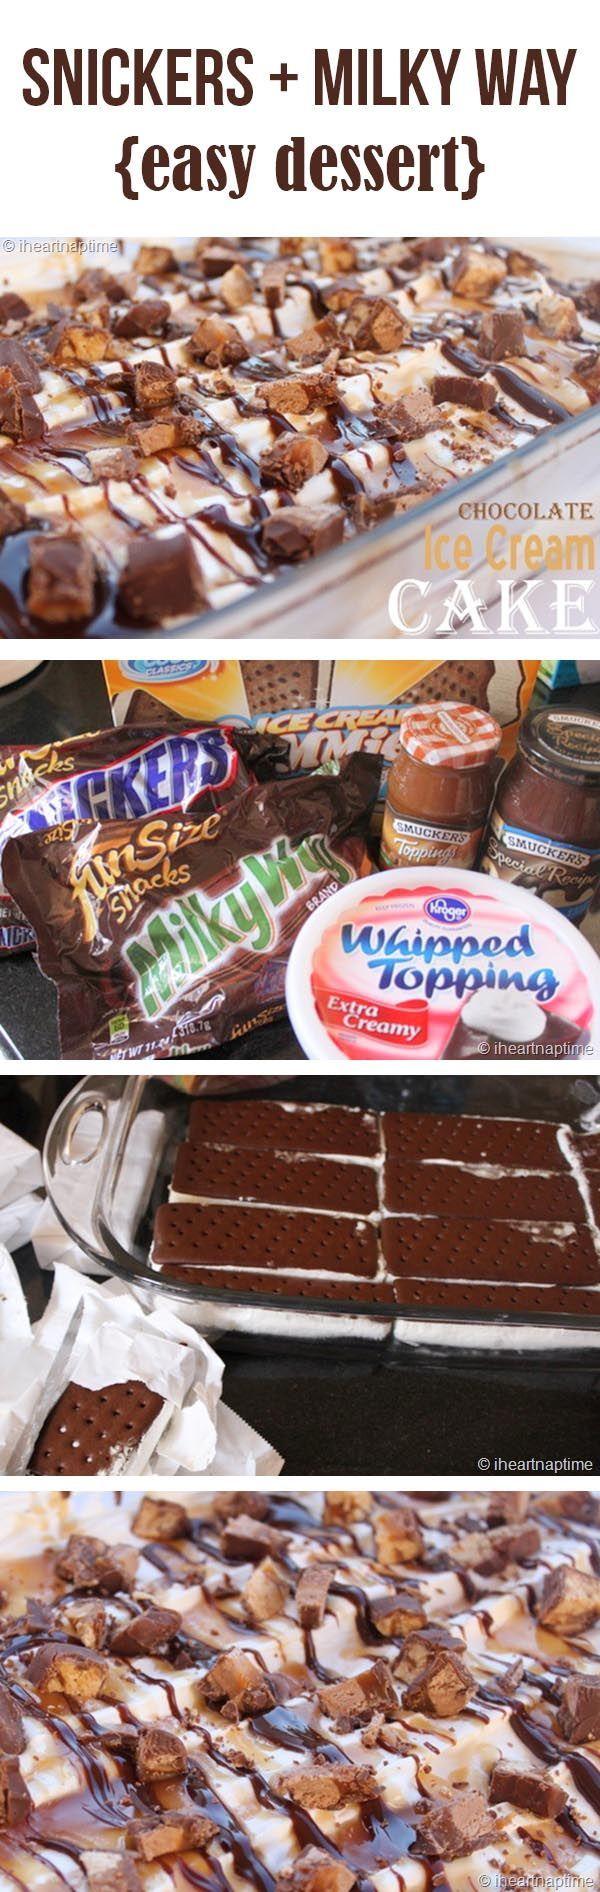 Chocolate Caramel Ice Cream Cake. Why did I never think of using ice cream sandwiches.